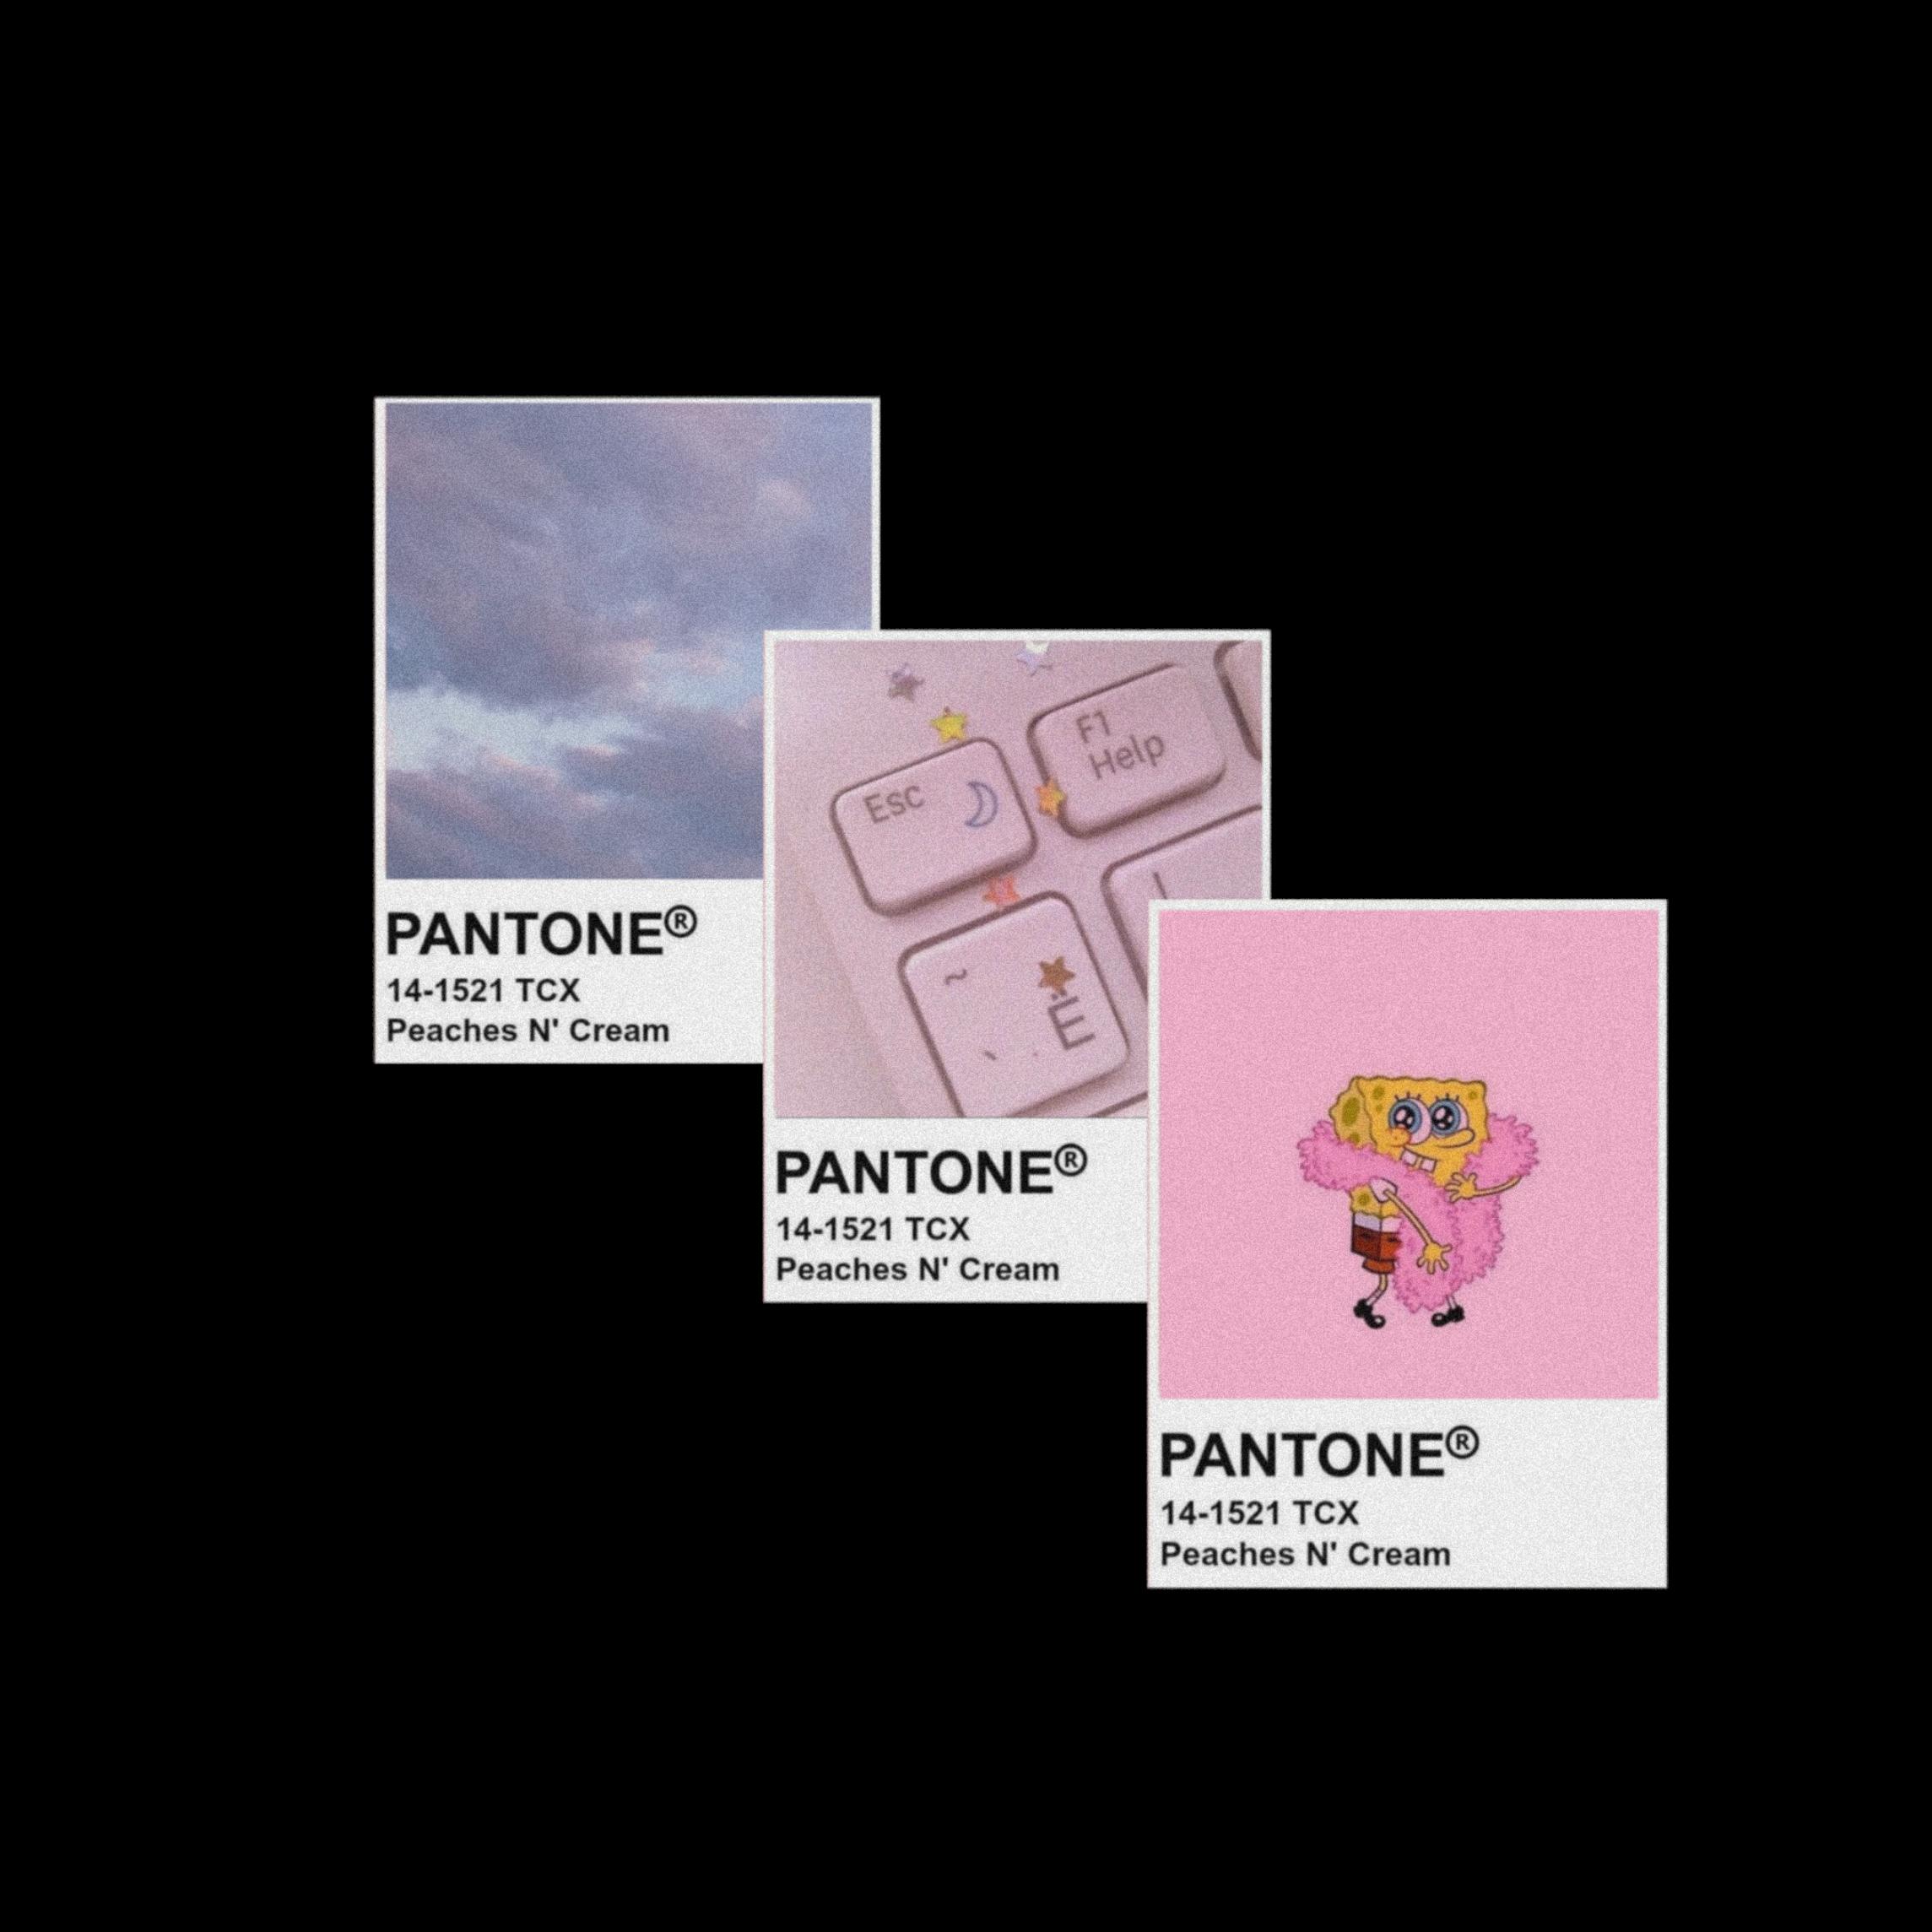 Freetoedit Aesthetic Pink Pantone Tattone Aesthetics Grungeaesthetic Grunge Vintage Tumb Aesthetic Stickers Cute Emoji Wallpaper Pastel Pink Aesthetic